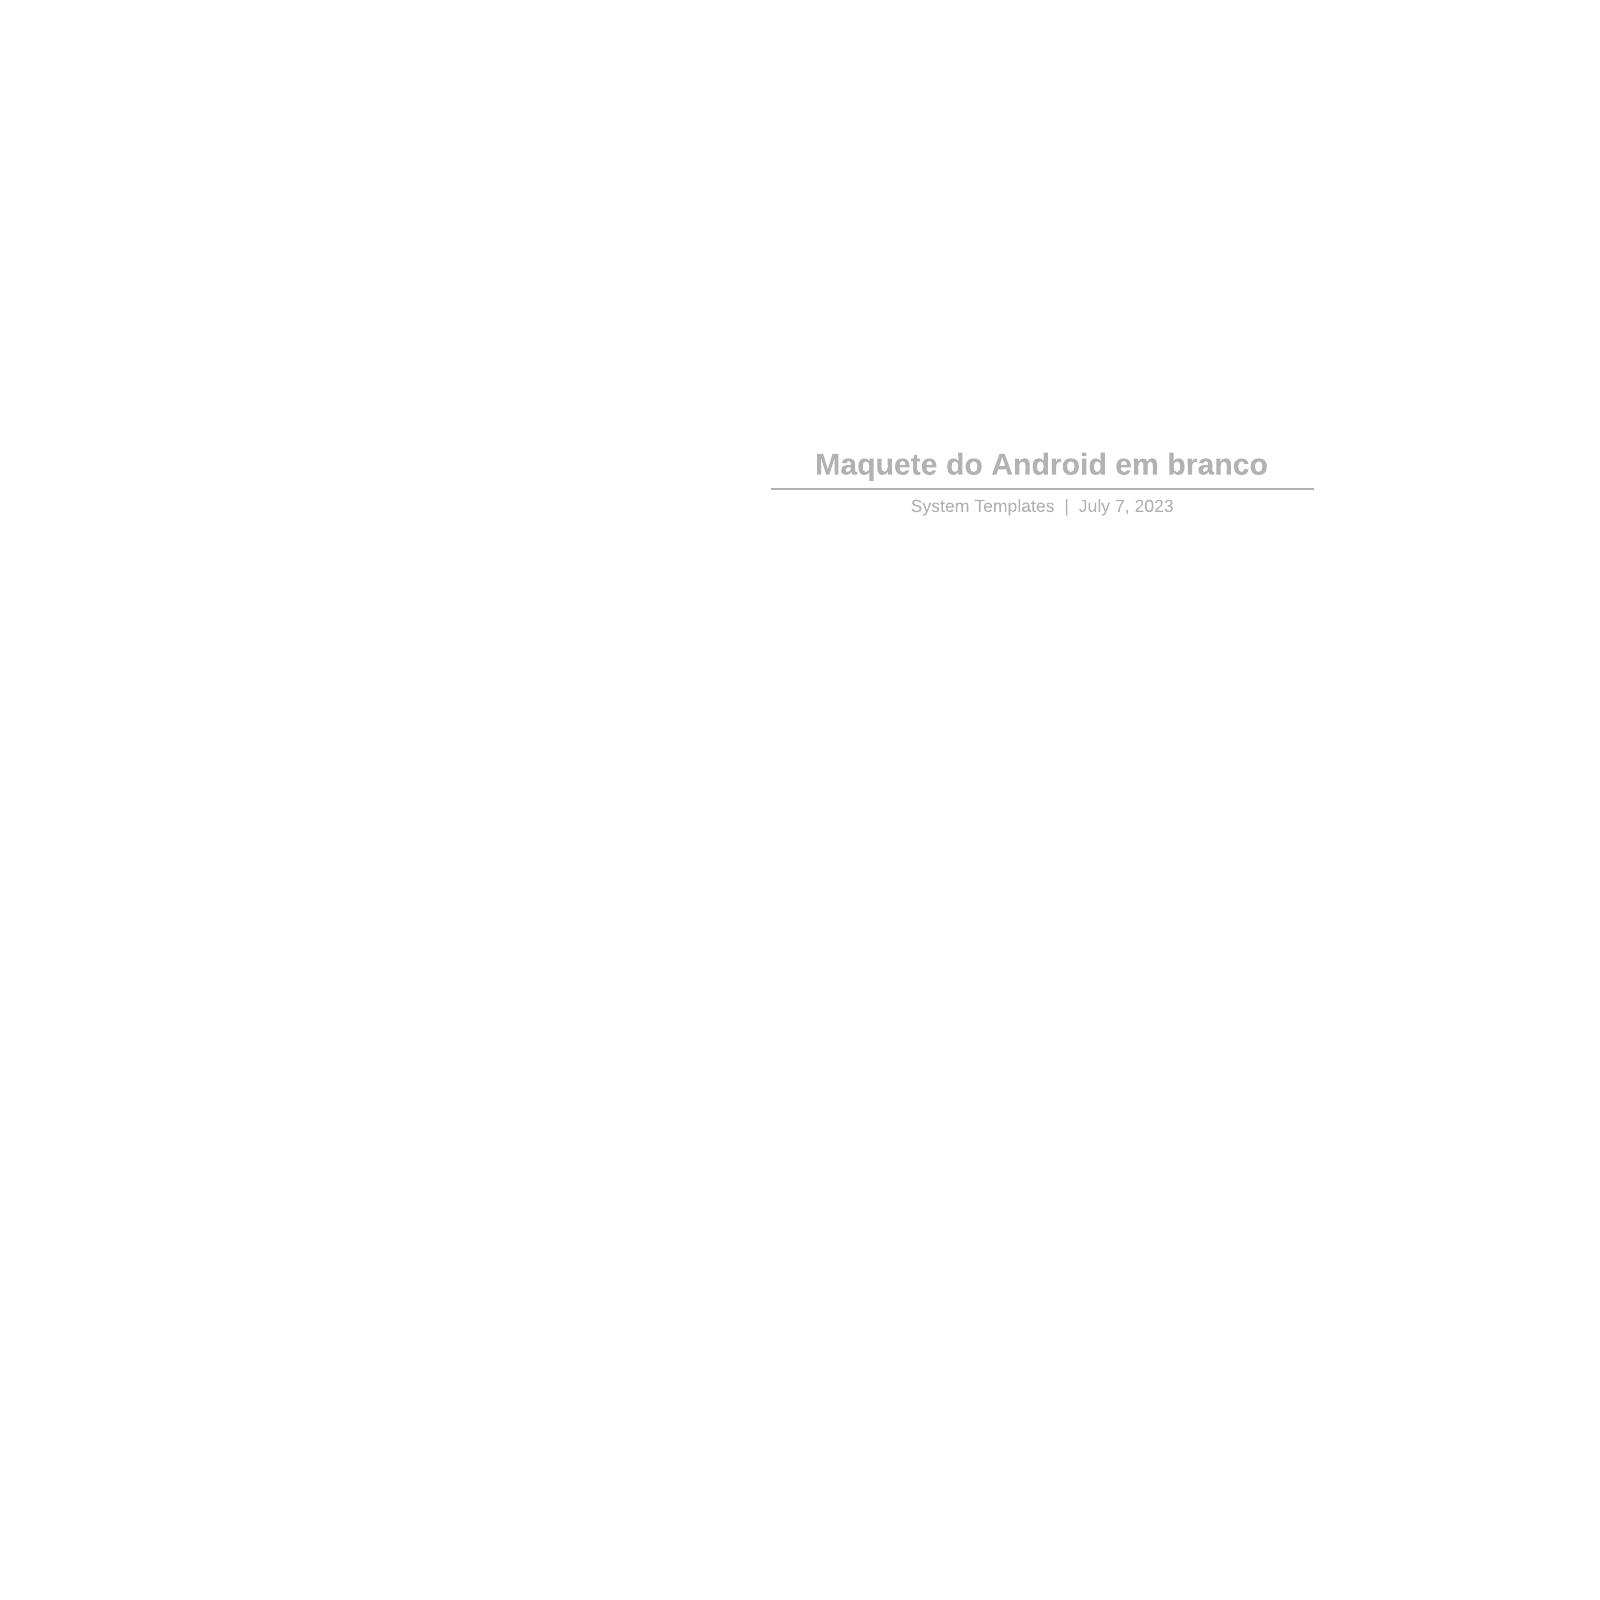 Mockup de smartphone Android em branco